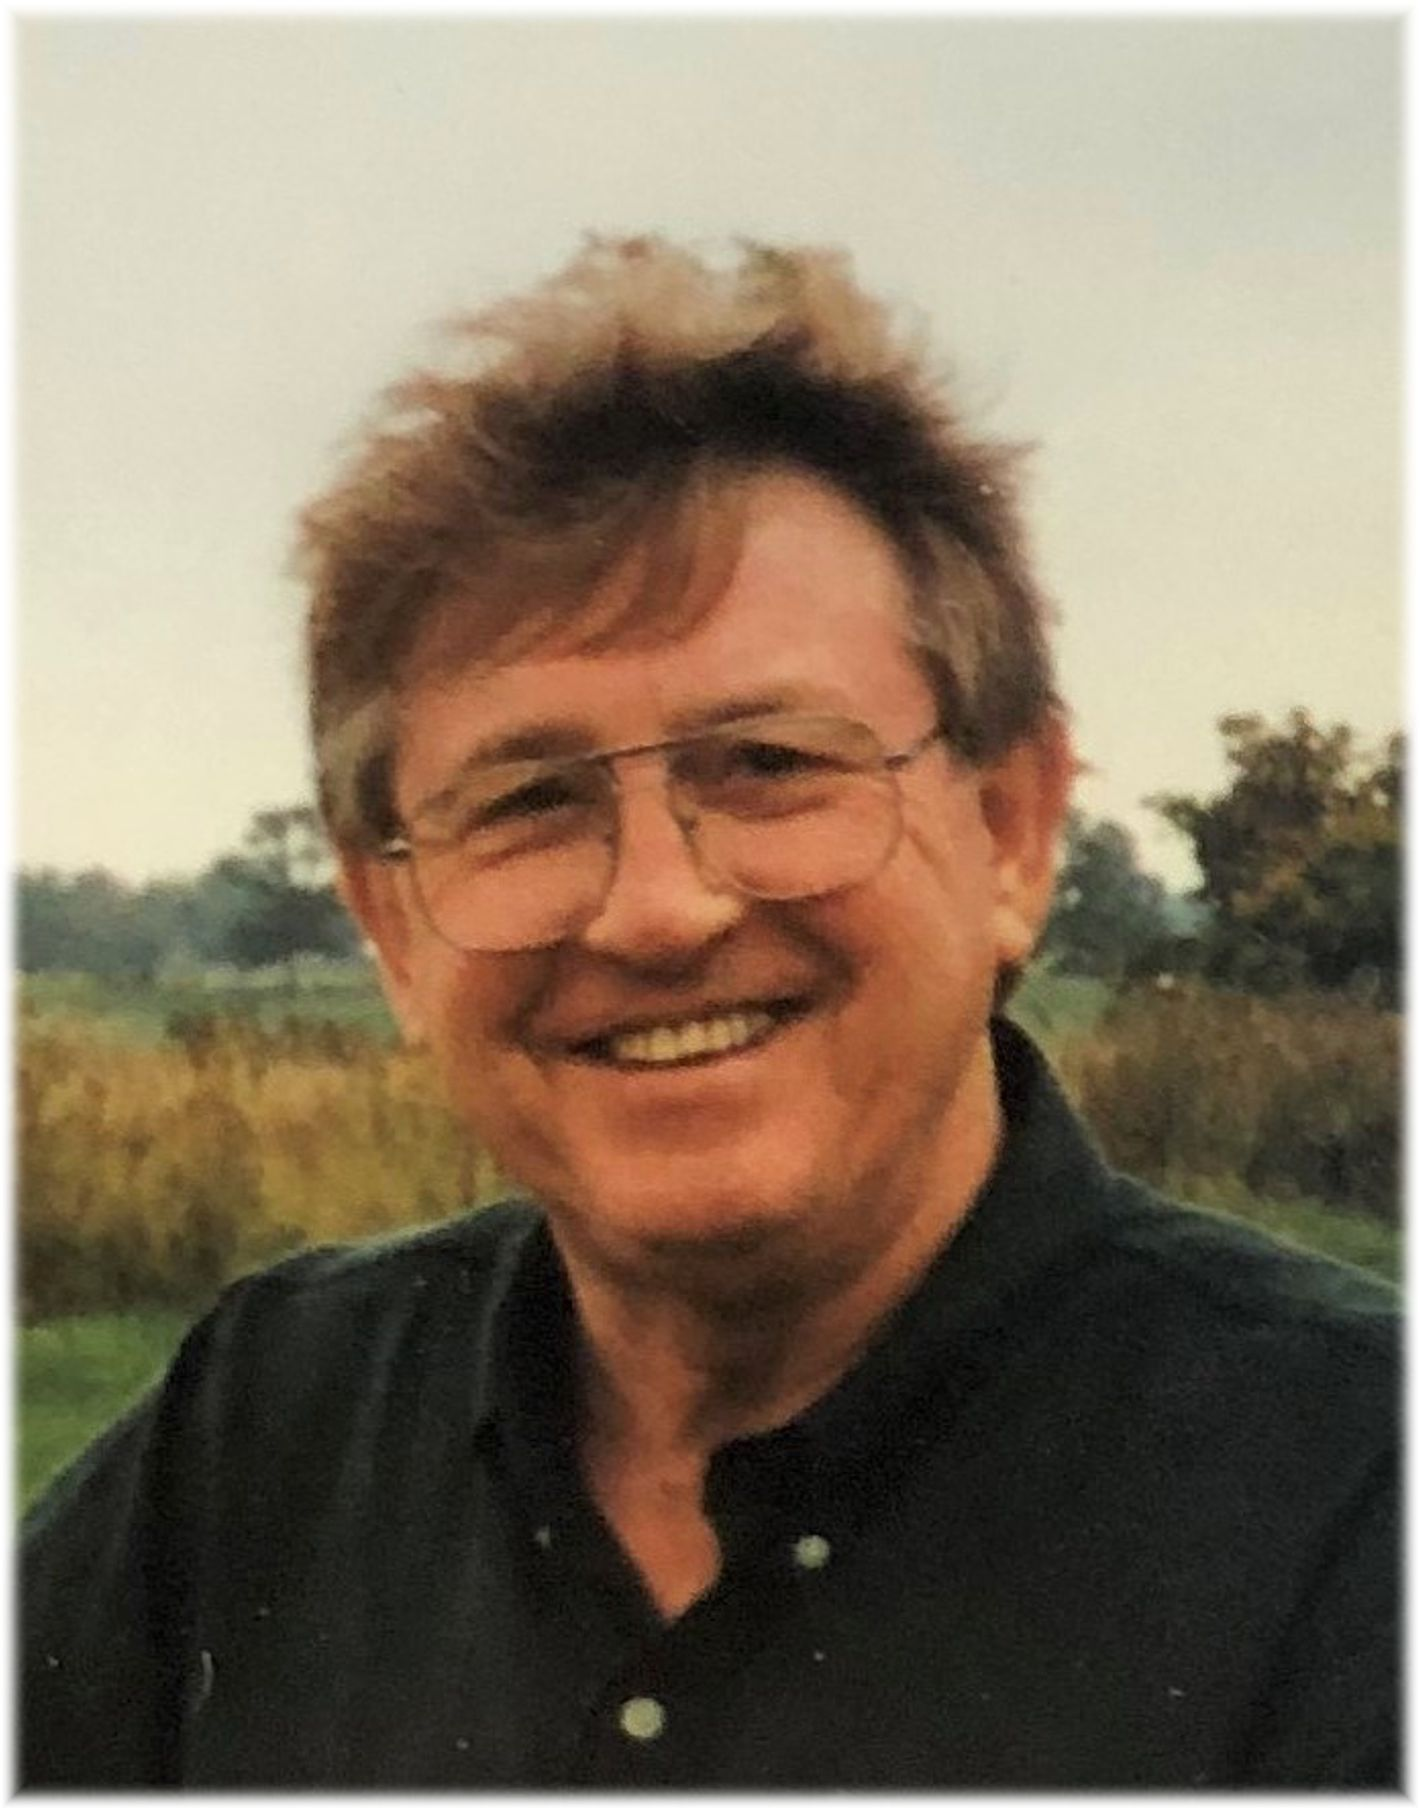 David George Knapp